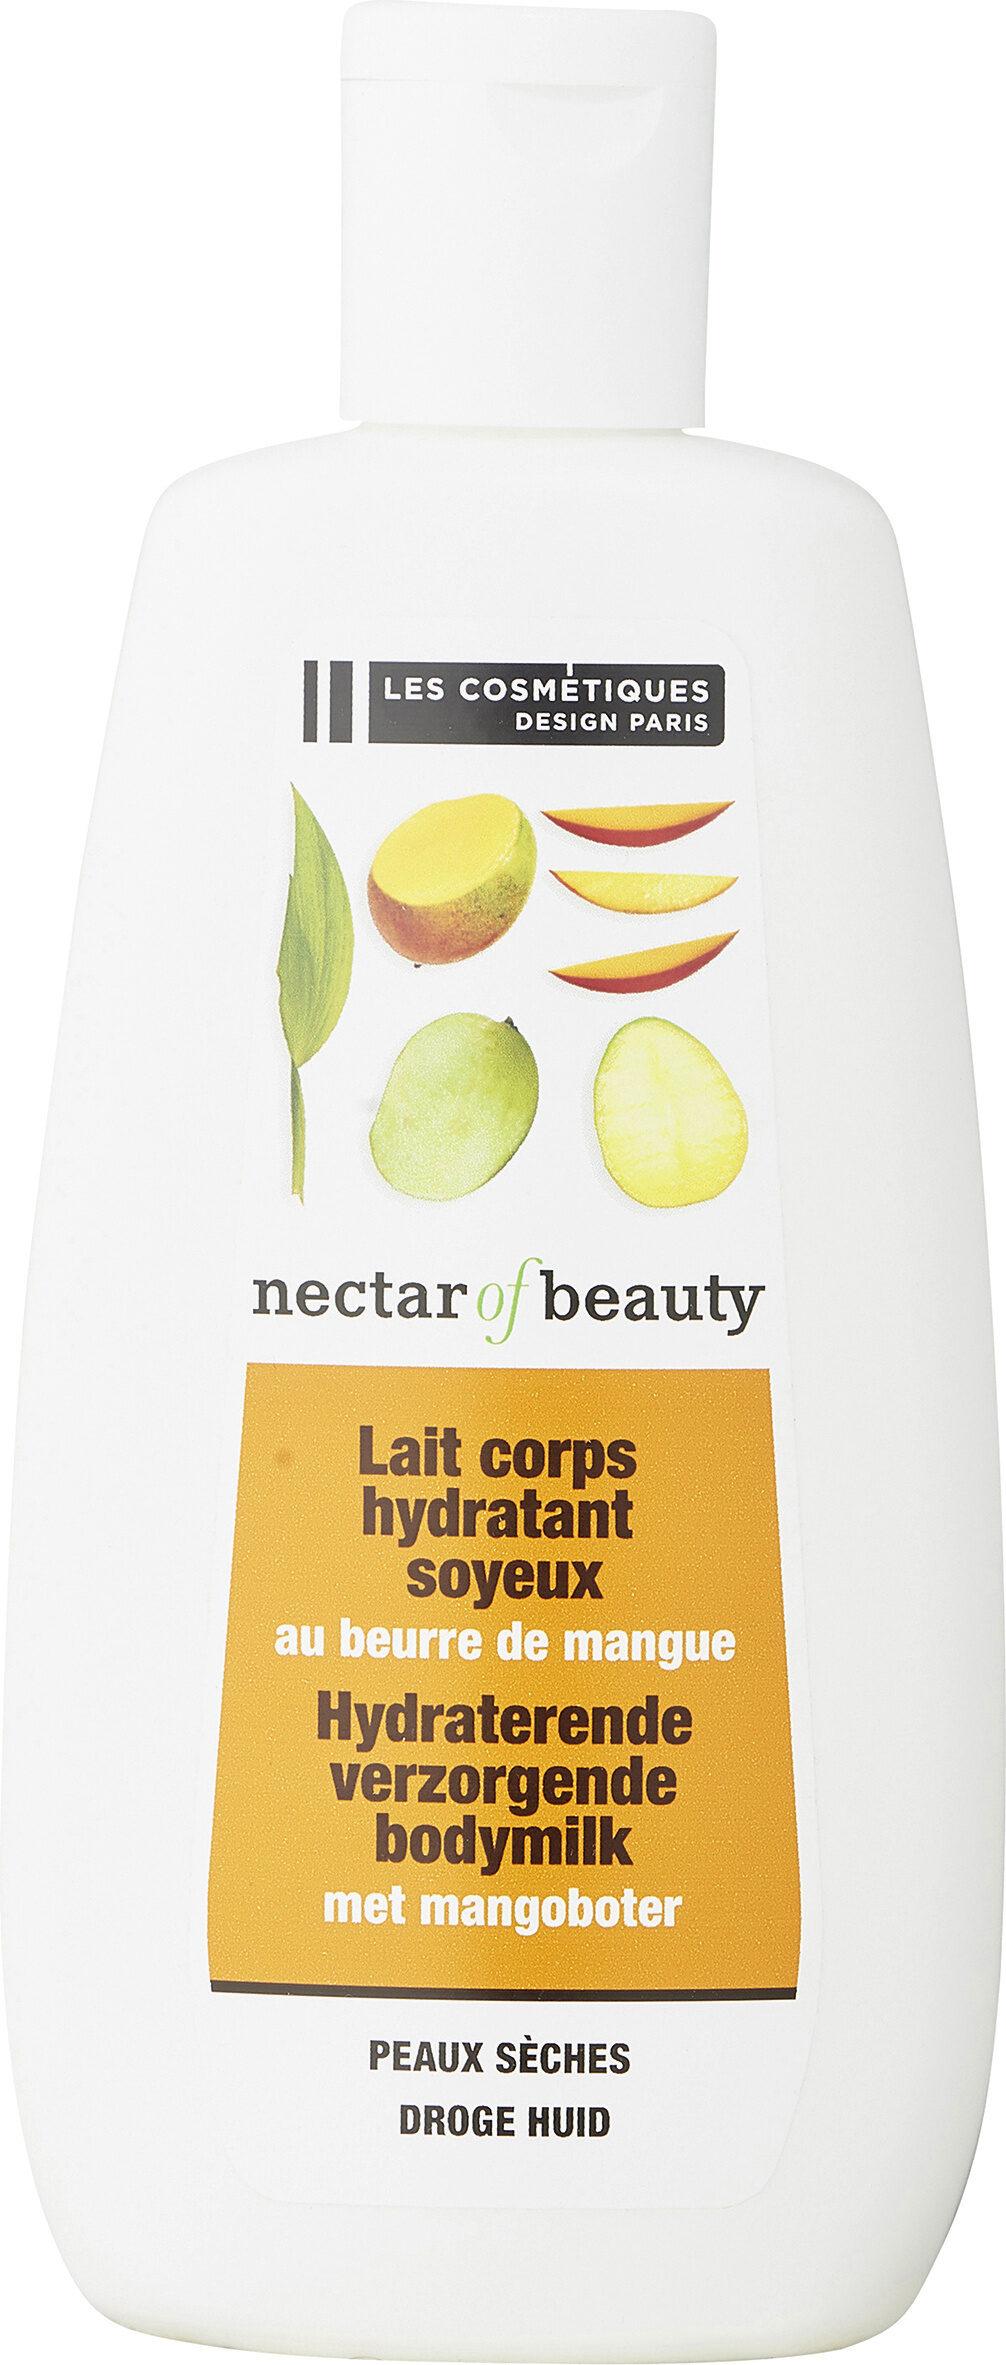 lait hydratant soyeux - Produit - fr